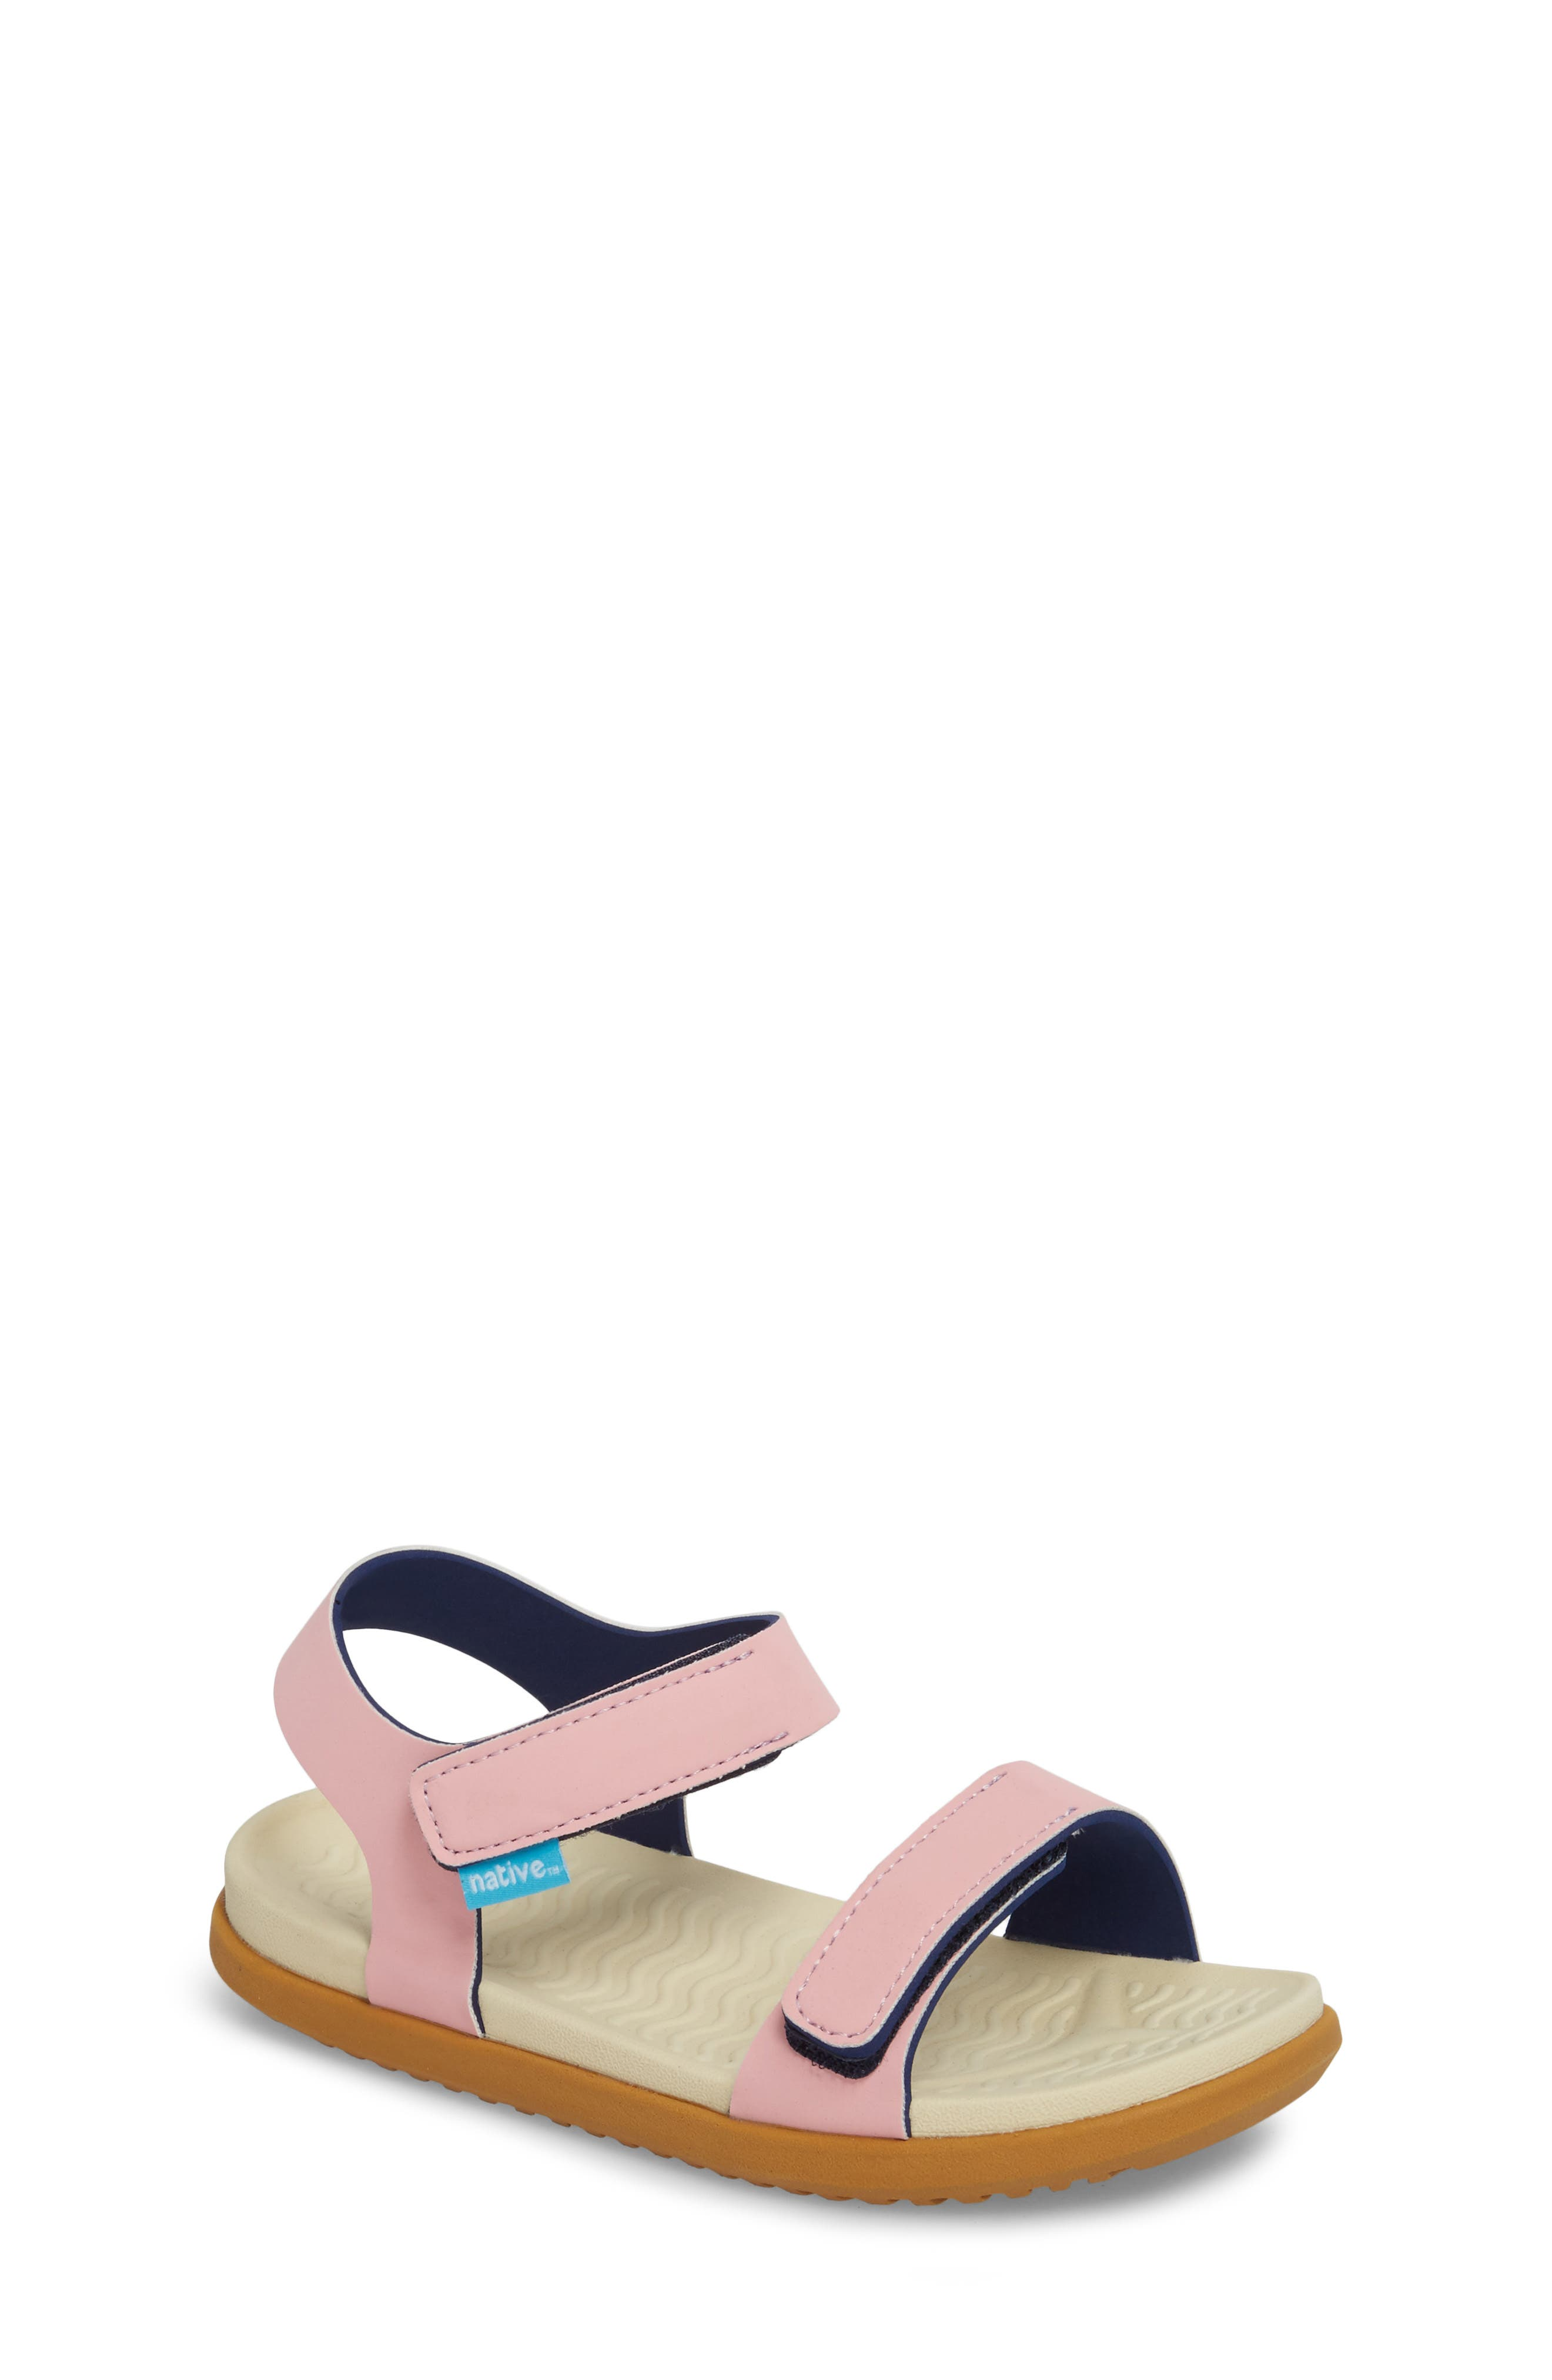 Toddler Girls Native Shoes Charley Child Waterproof Flat Vegan Sandal Size 10 M  Pink